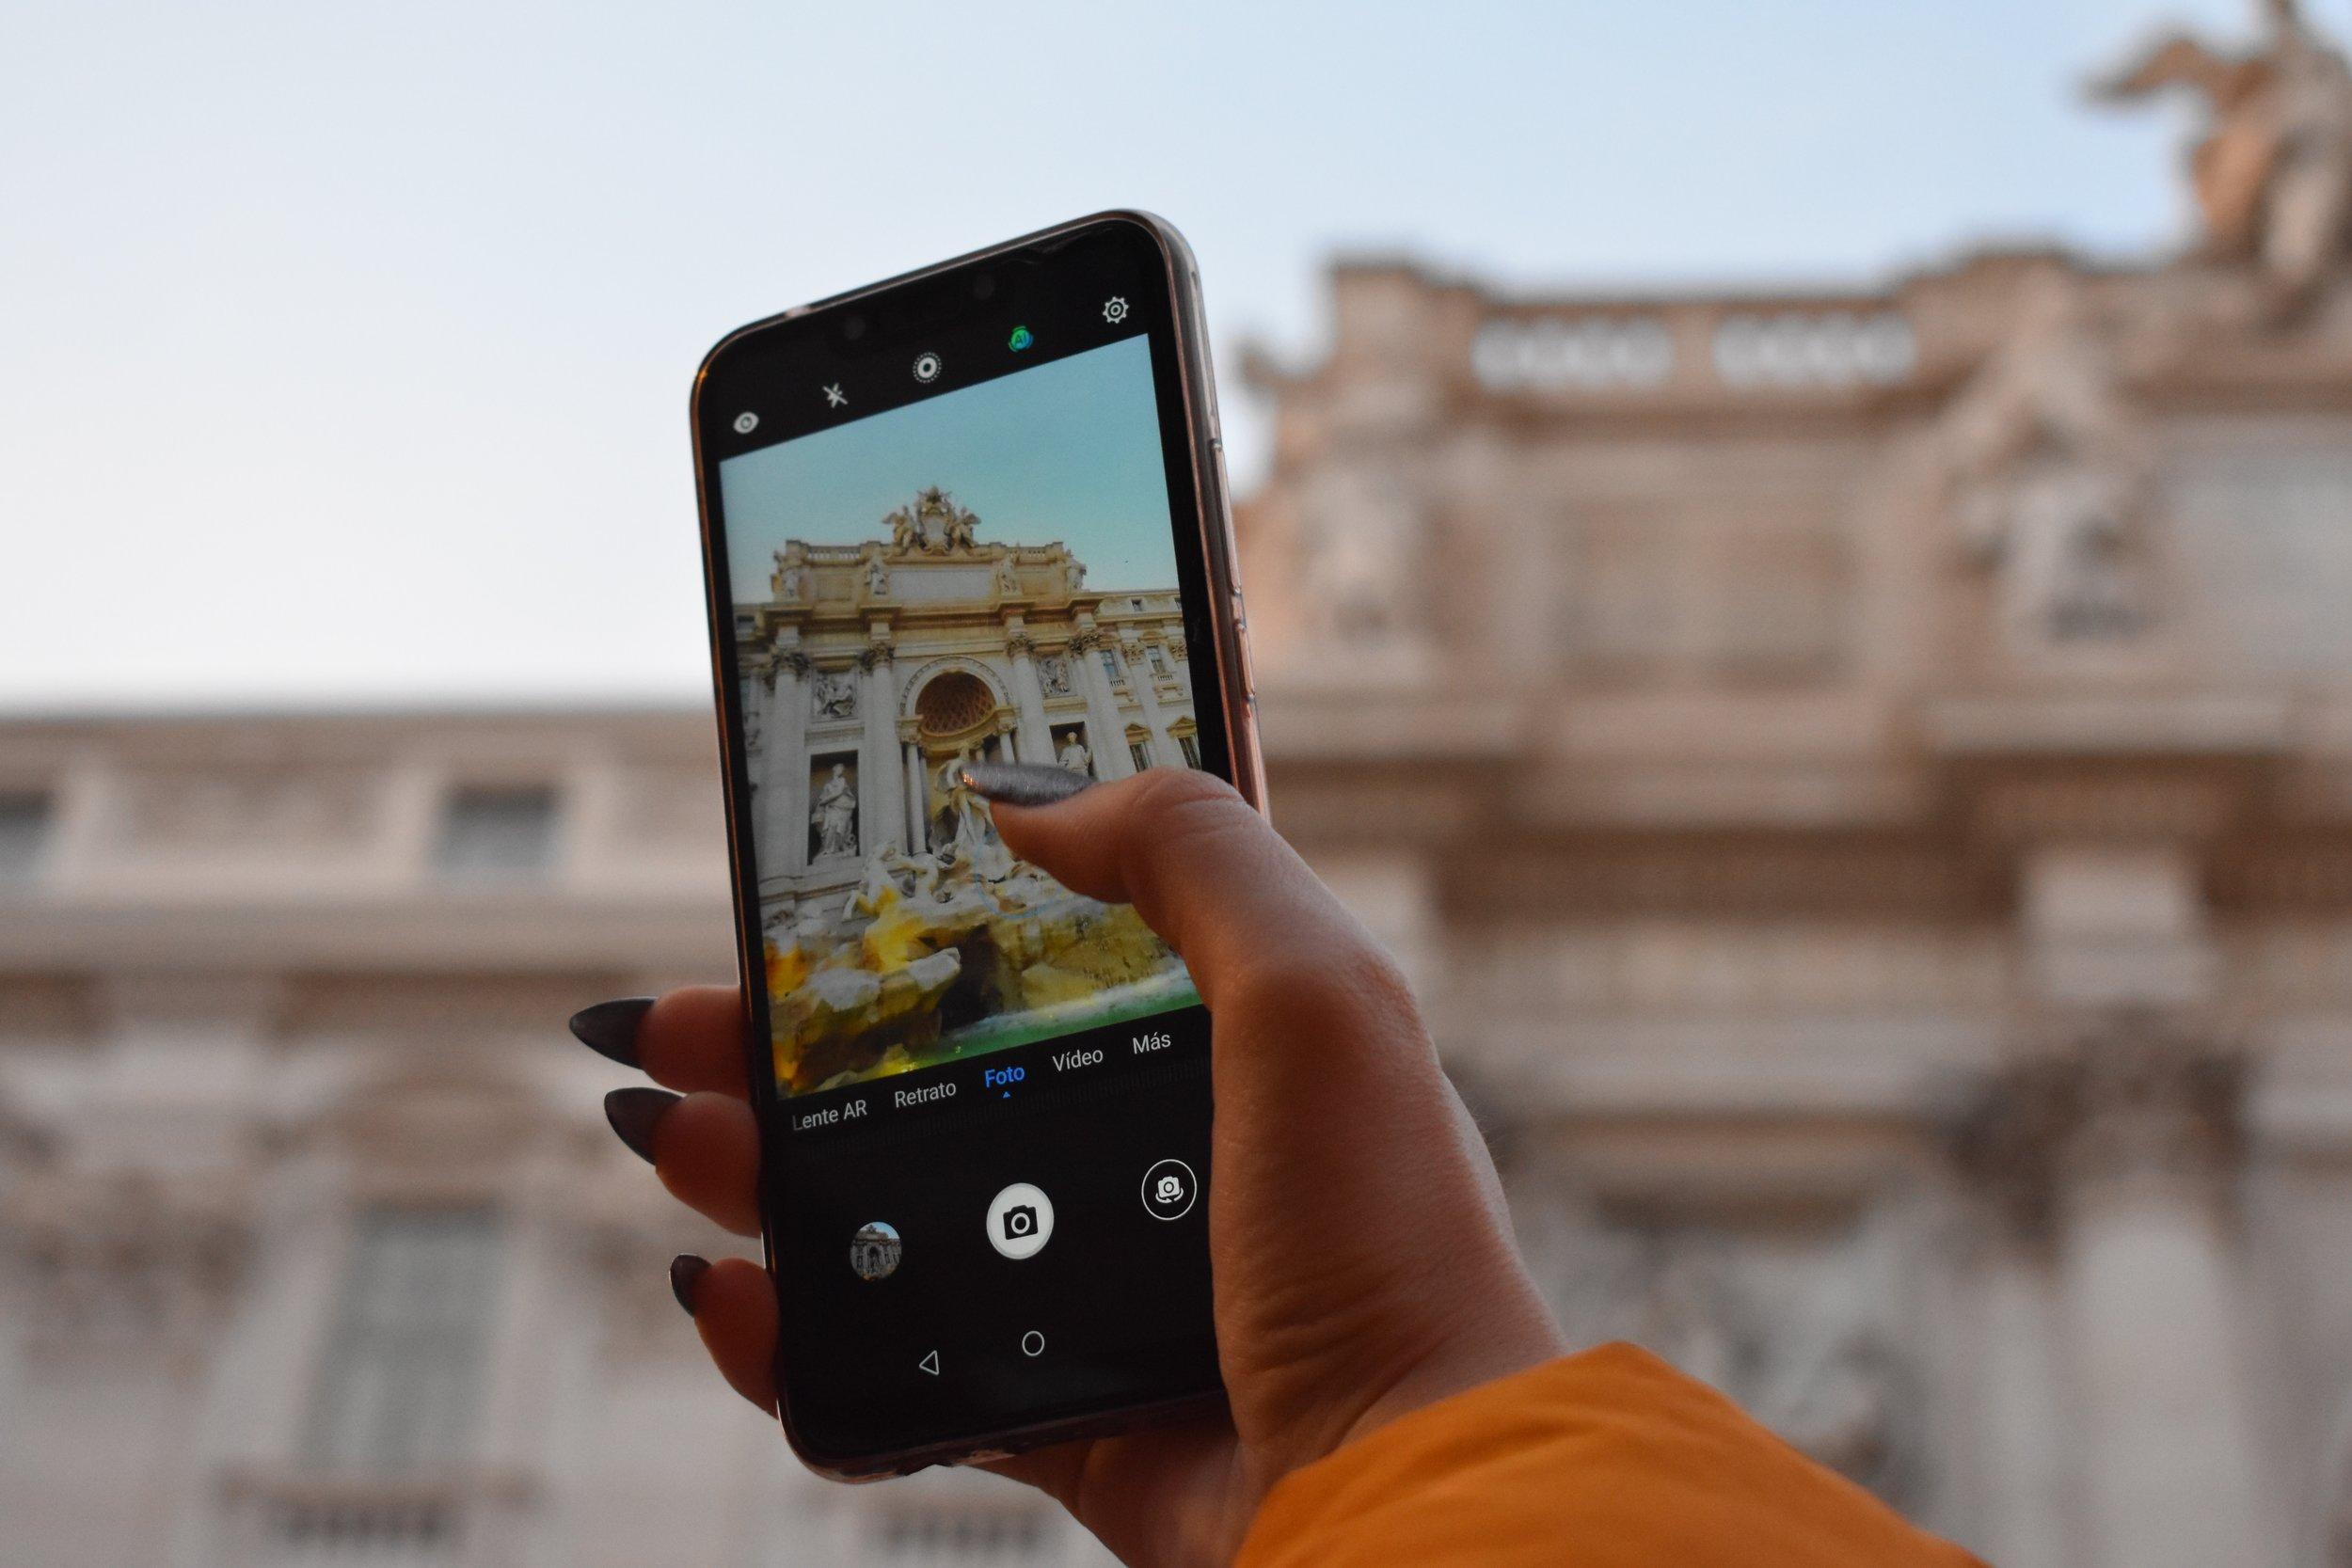 Using Photos as Communication -